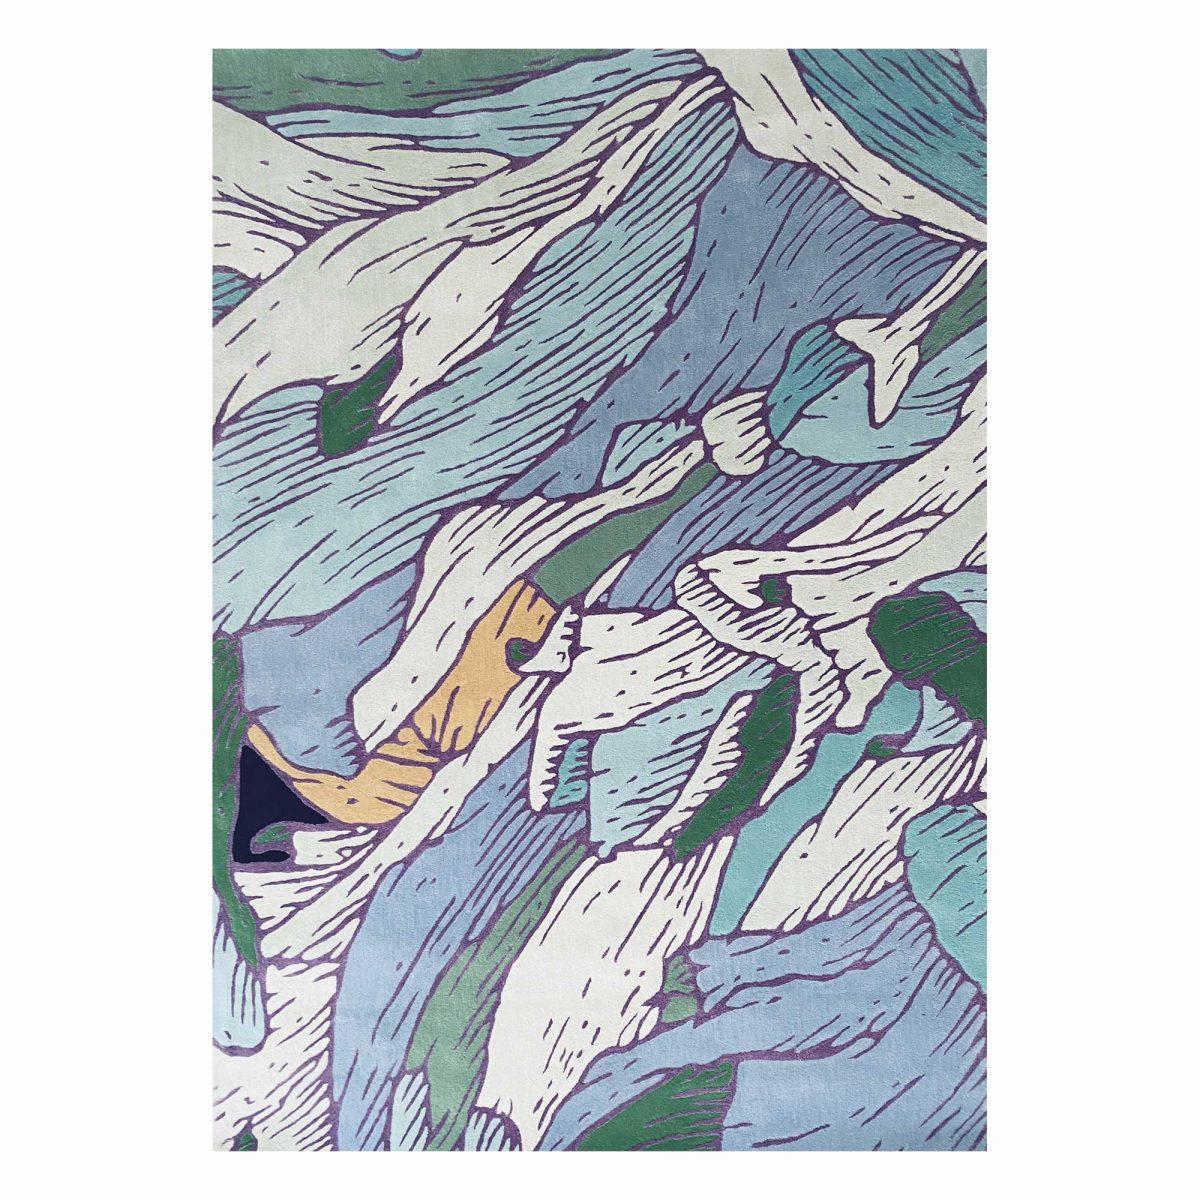 maison-dada-clement-vuillier-tapis-jardin-de-rocaille-05-rugs